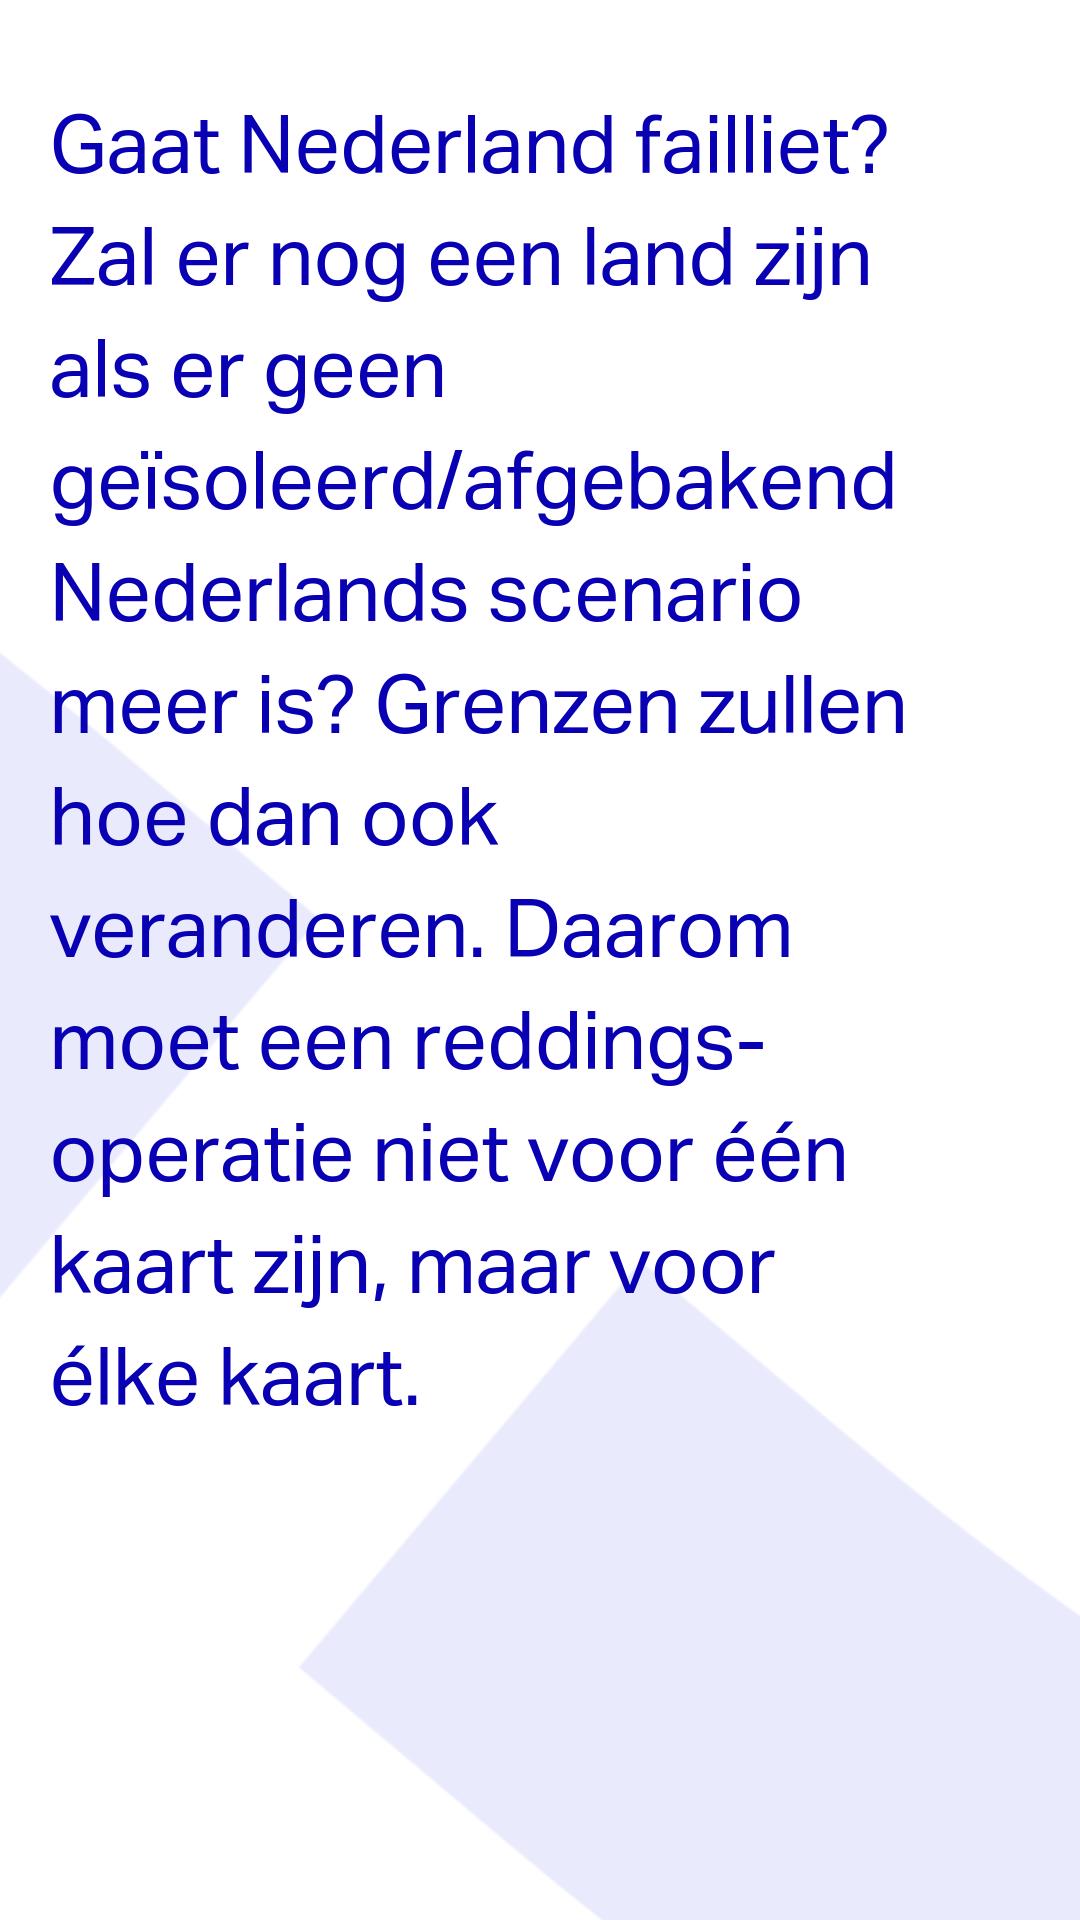 Taskforce-Fashion-Fashion-After-Flood-Kennismaking-Maastricht-algmeen_1.png